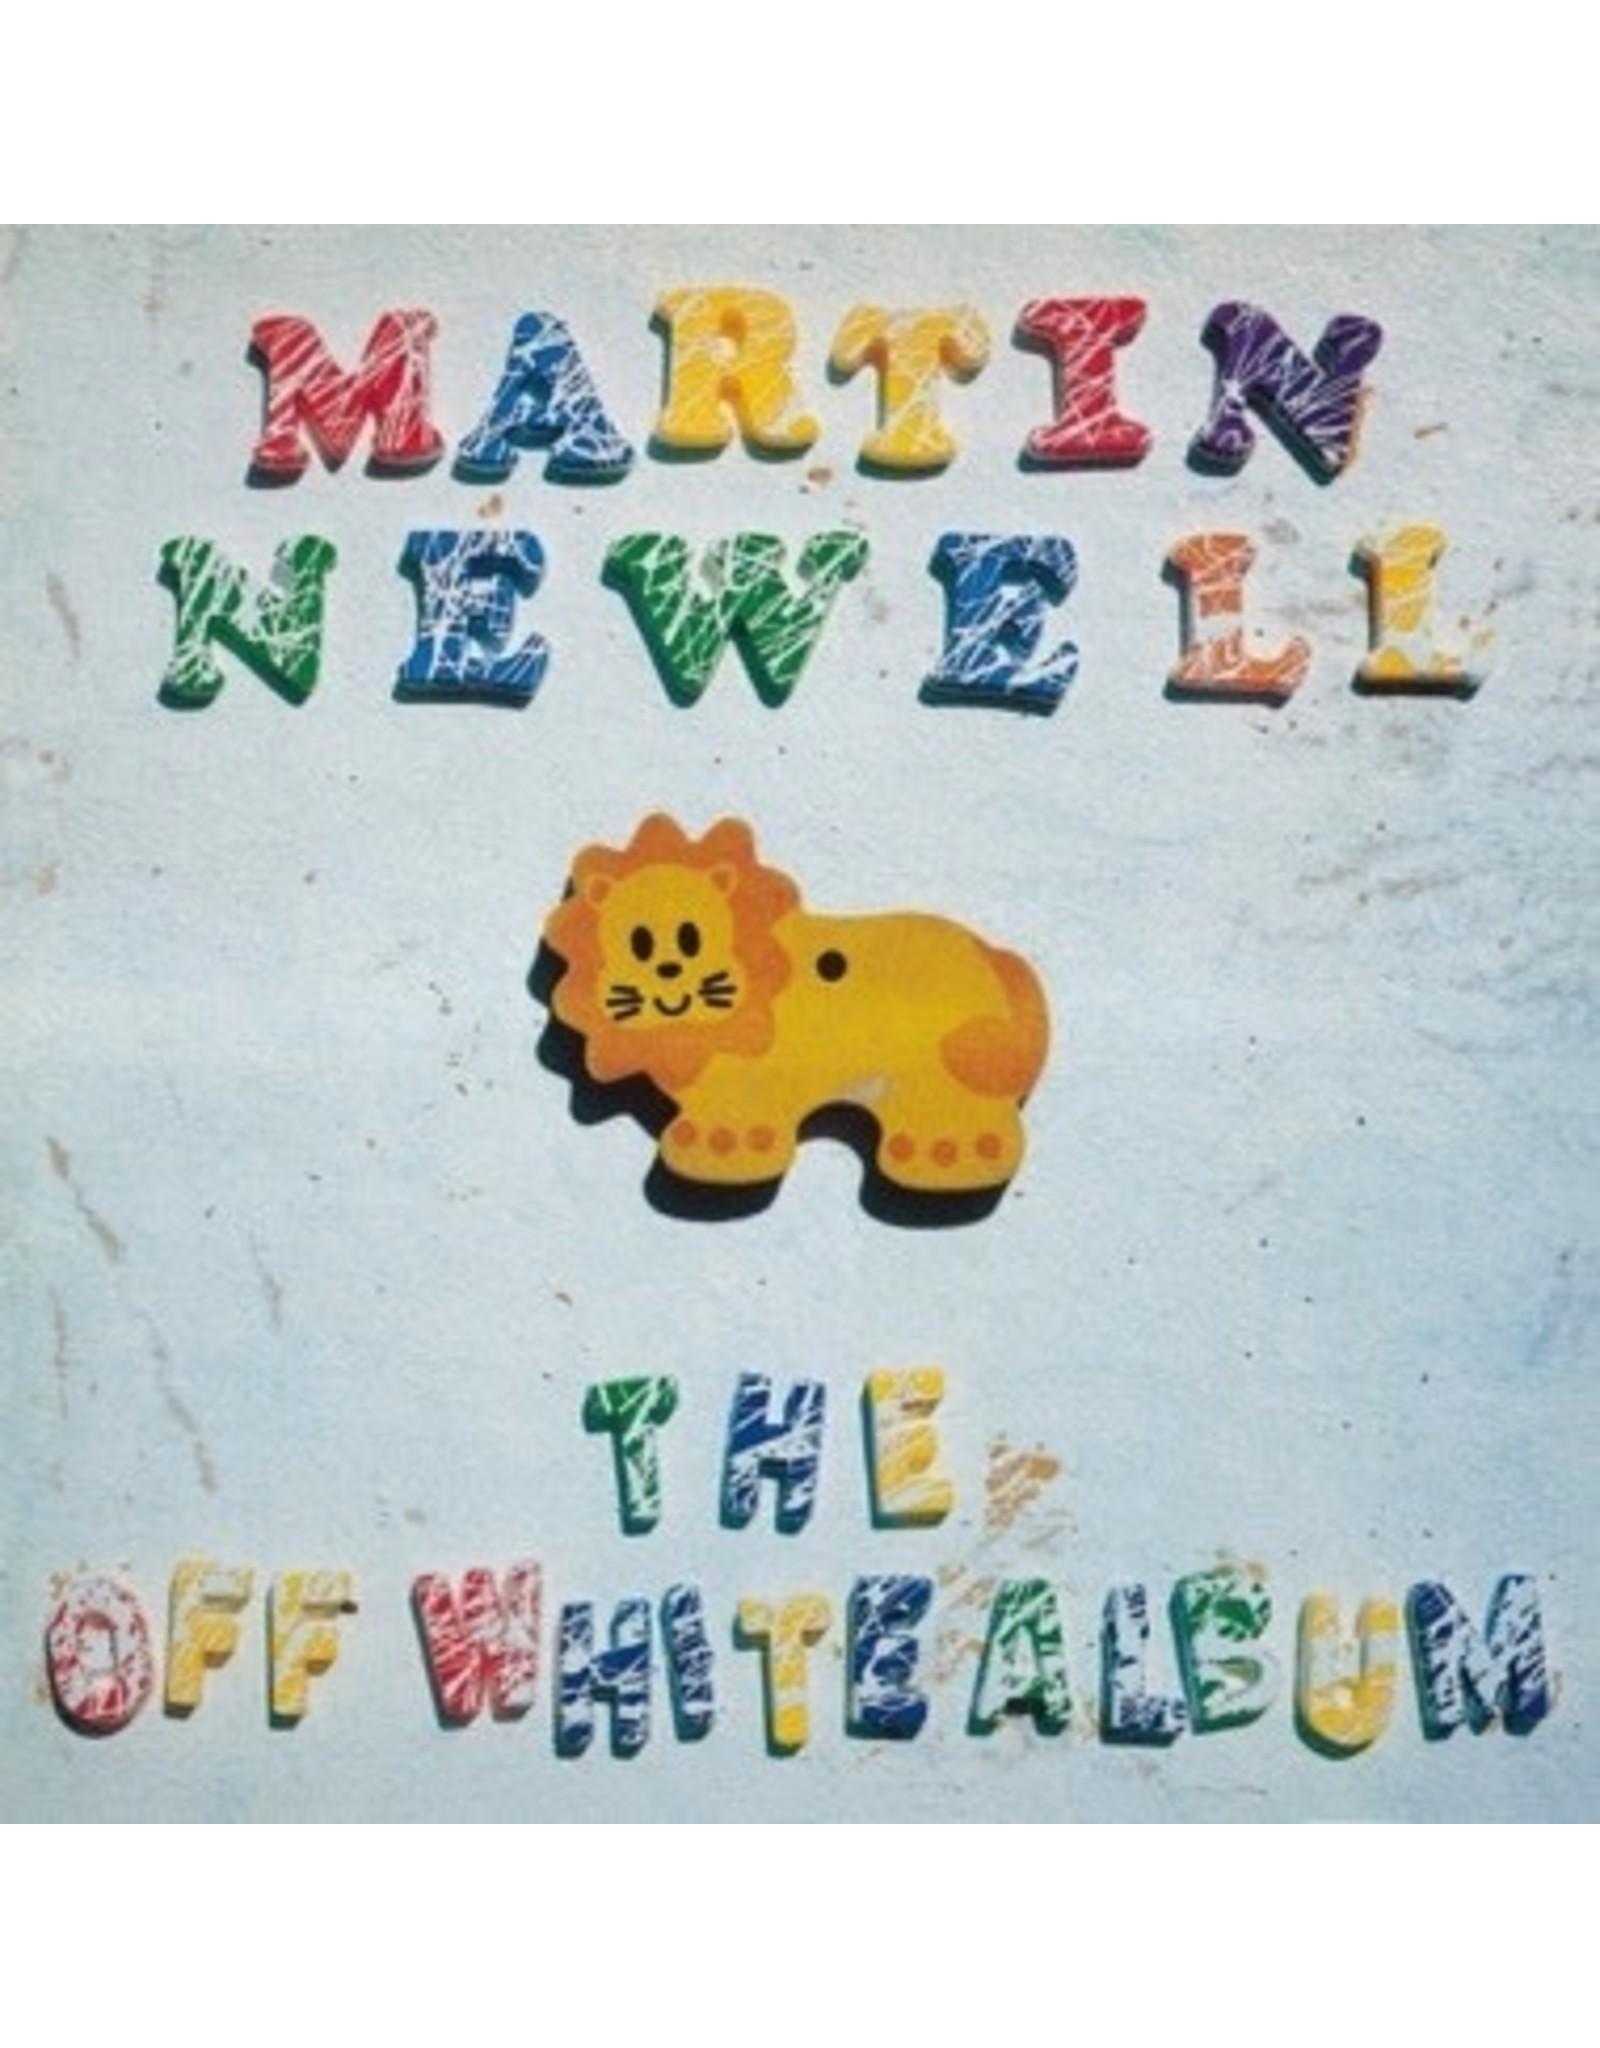 New Vinyl Martin Newell - The Off White Album (Colored) LP